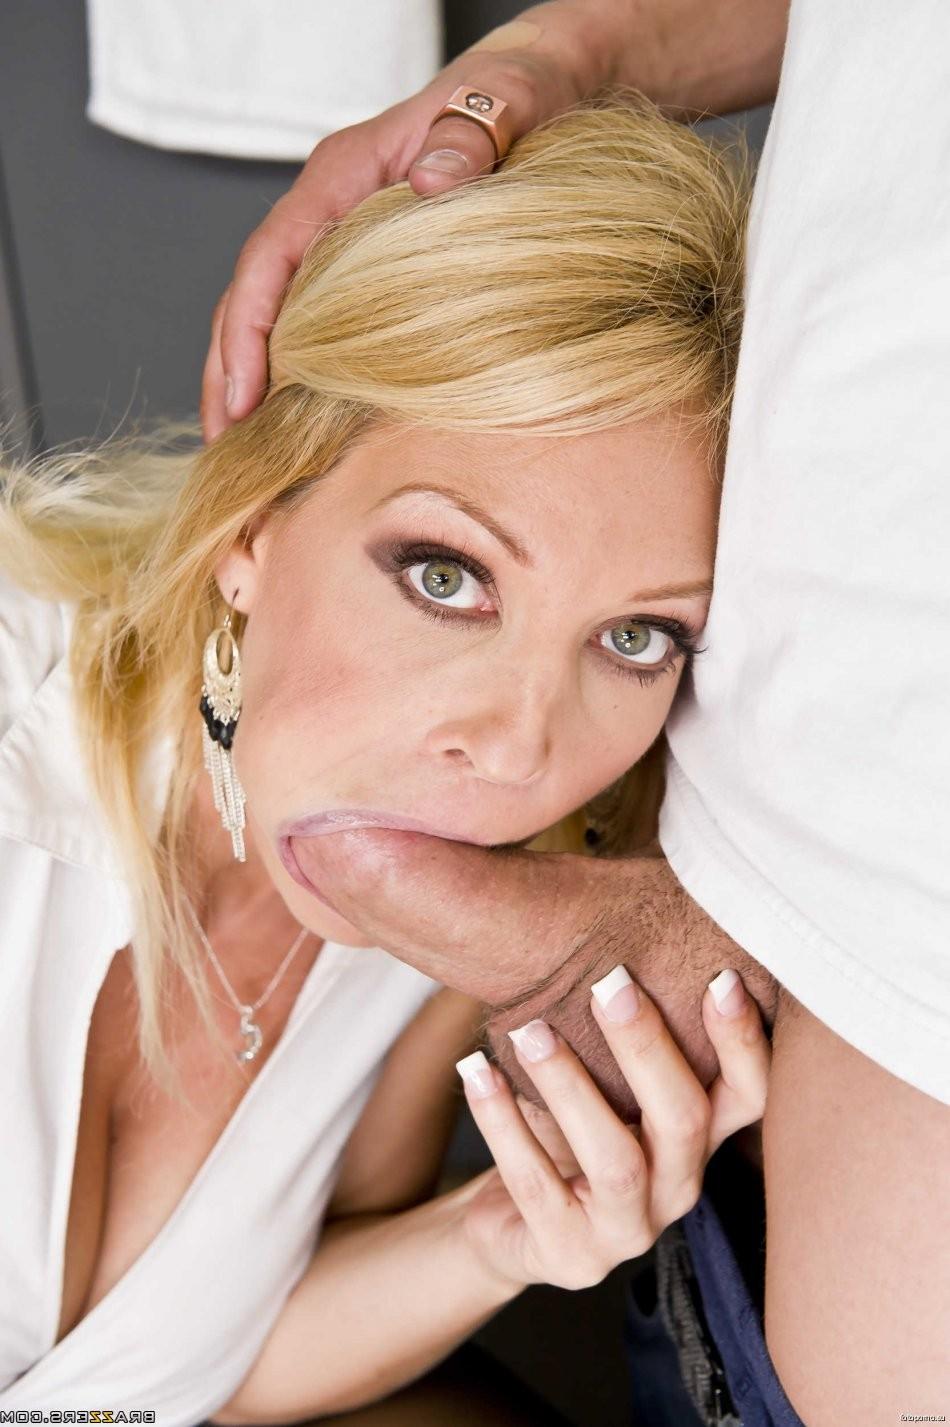 nurse hairy armpit – Pornostar